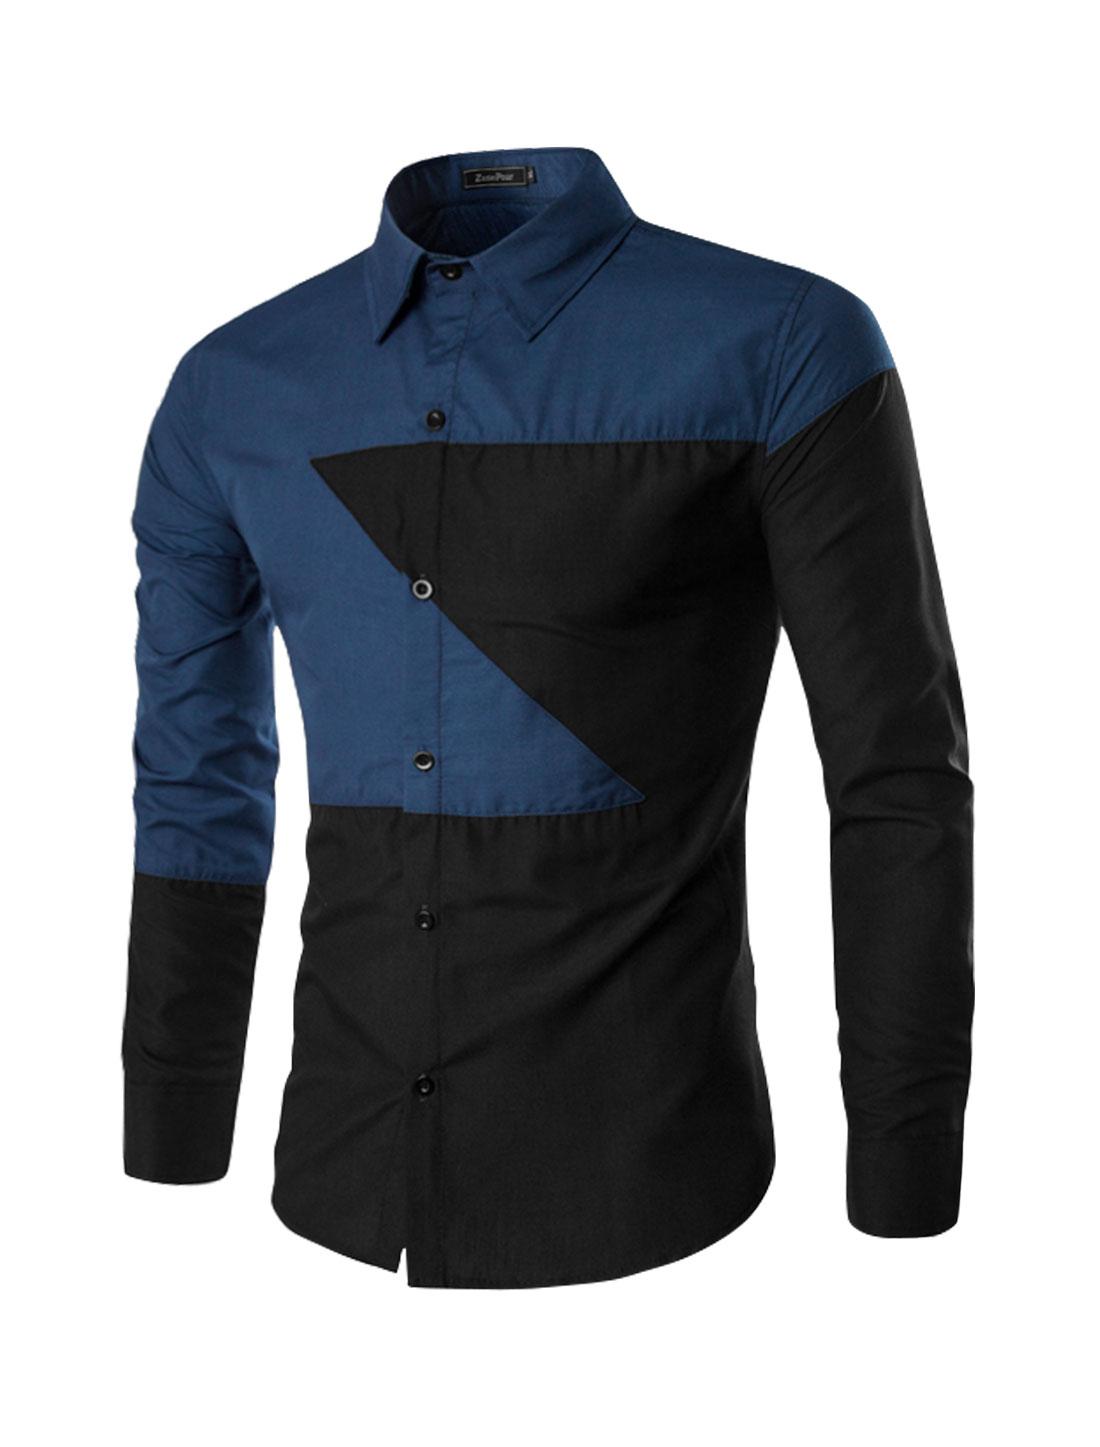 Men Long Sleeves Contrast Color Button Up Slim Fit Shirt Black M